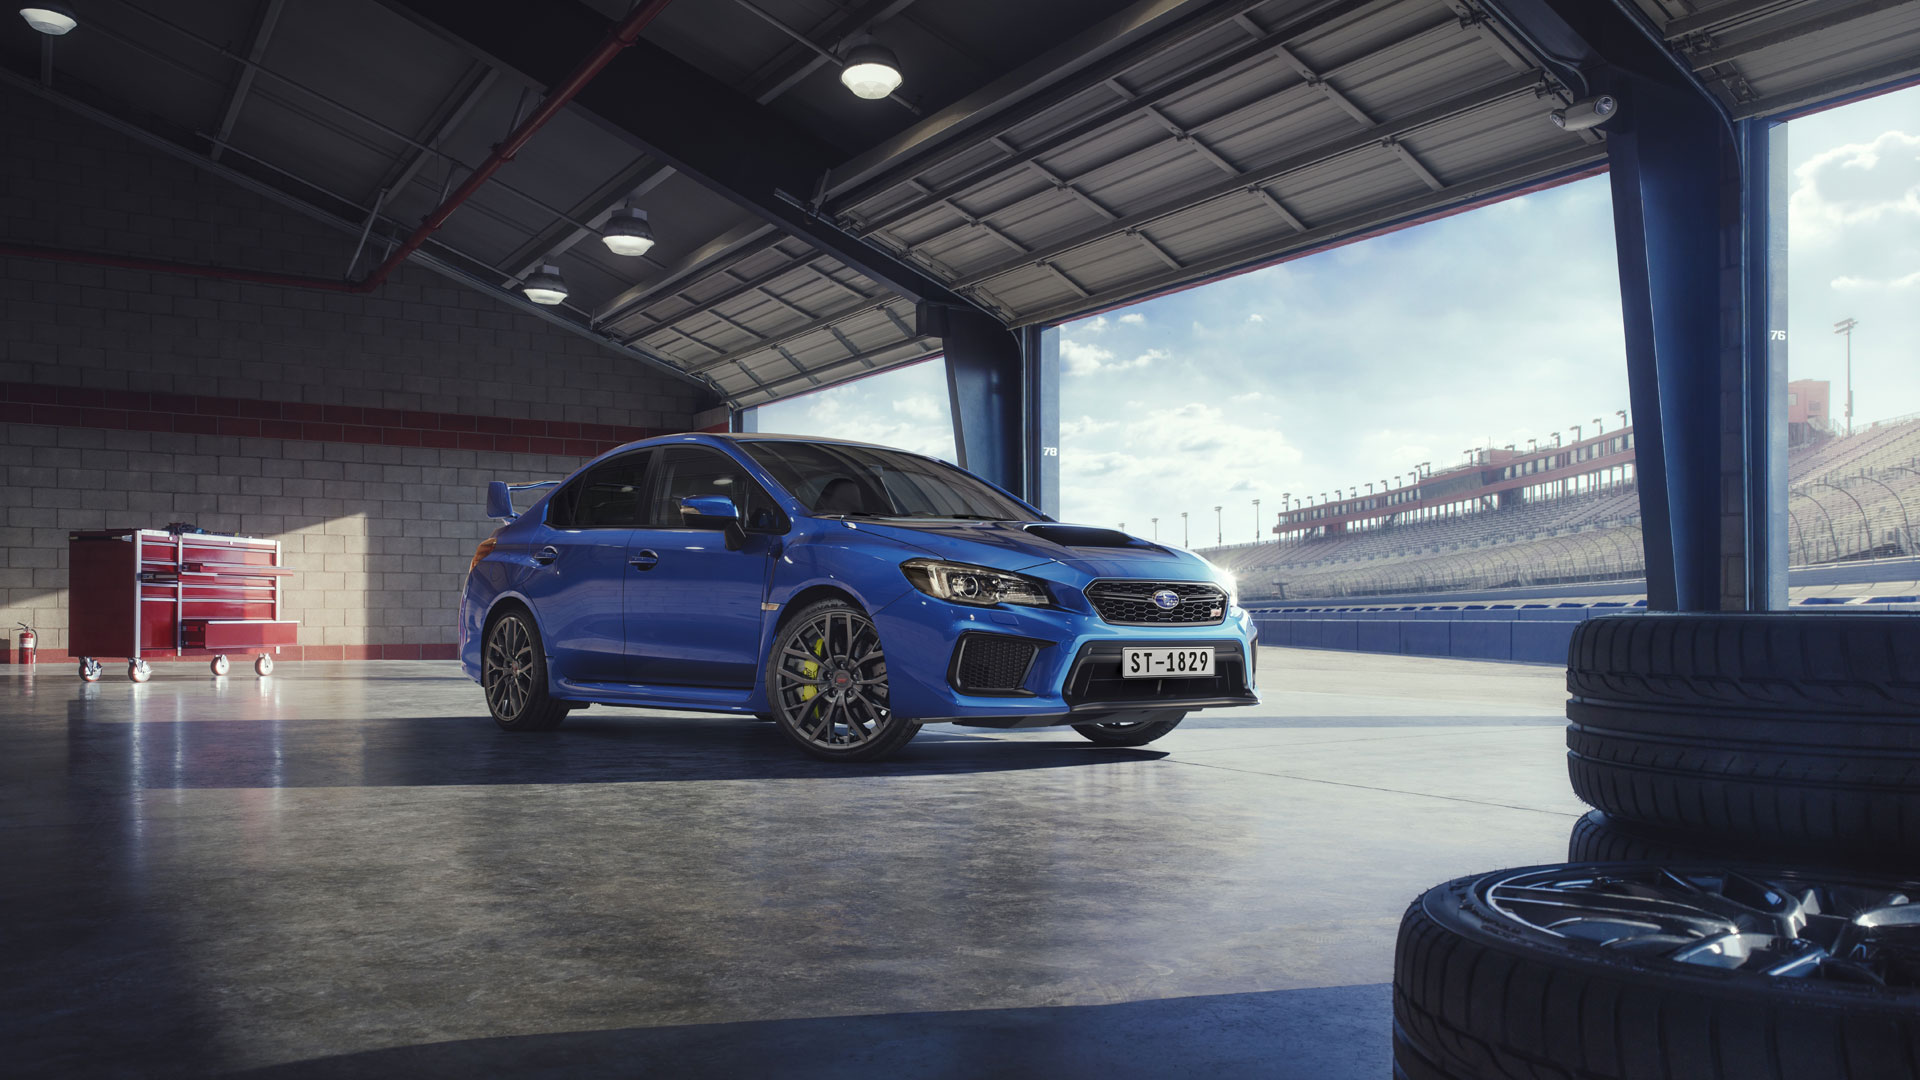 2018 Subaru Wrx Wrx Sti Colors Trims Engine Specs Features